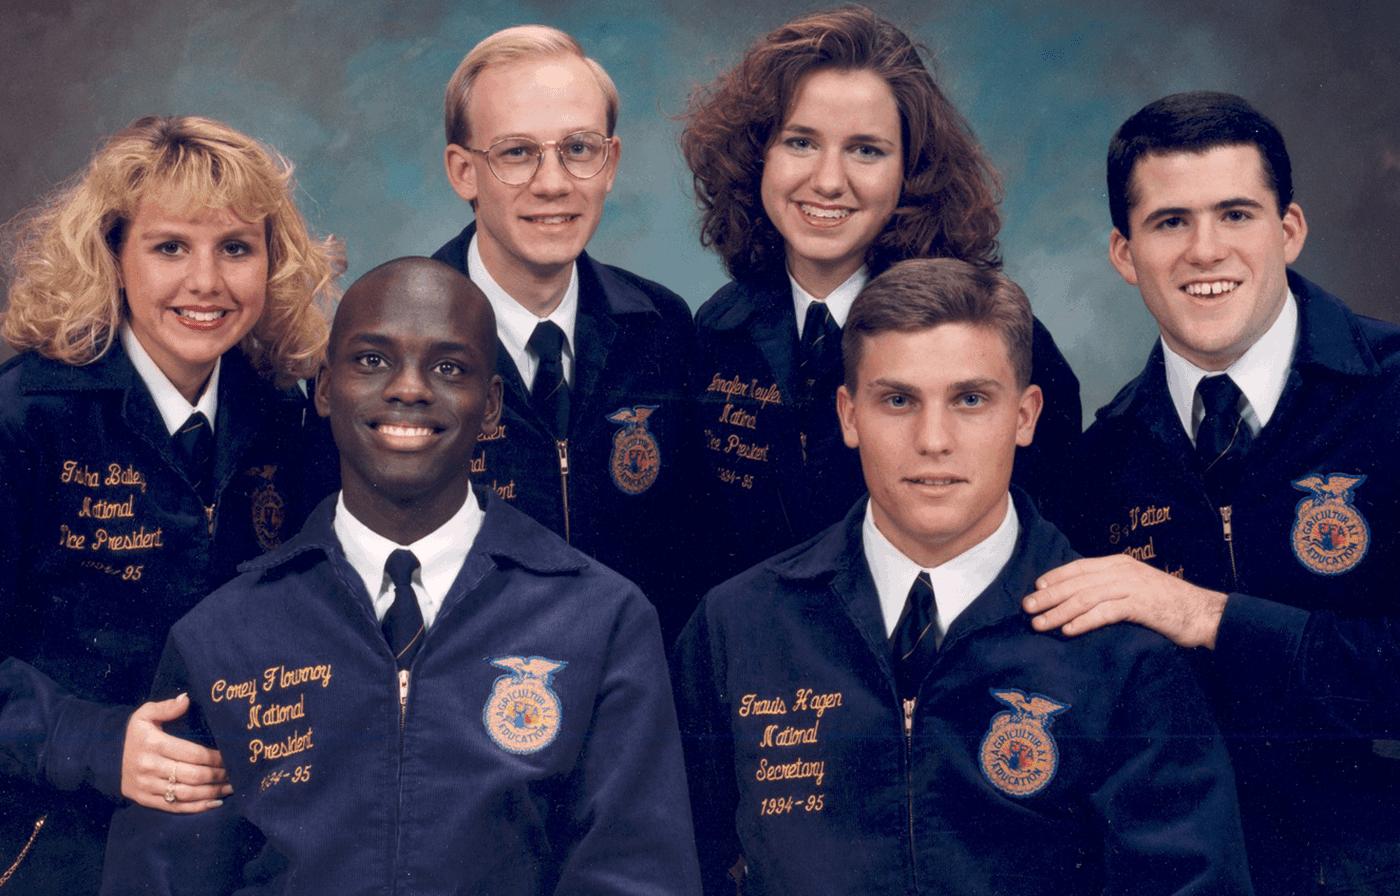 1994-95 National FFA Officer Team